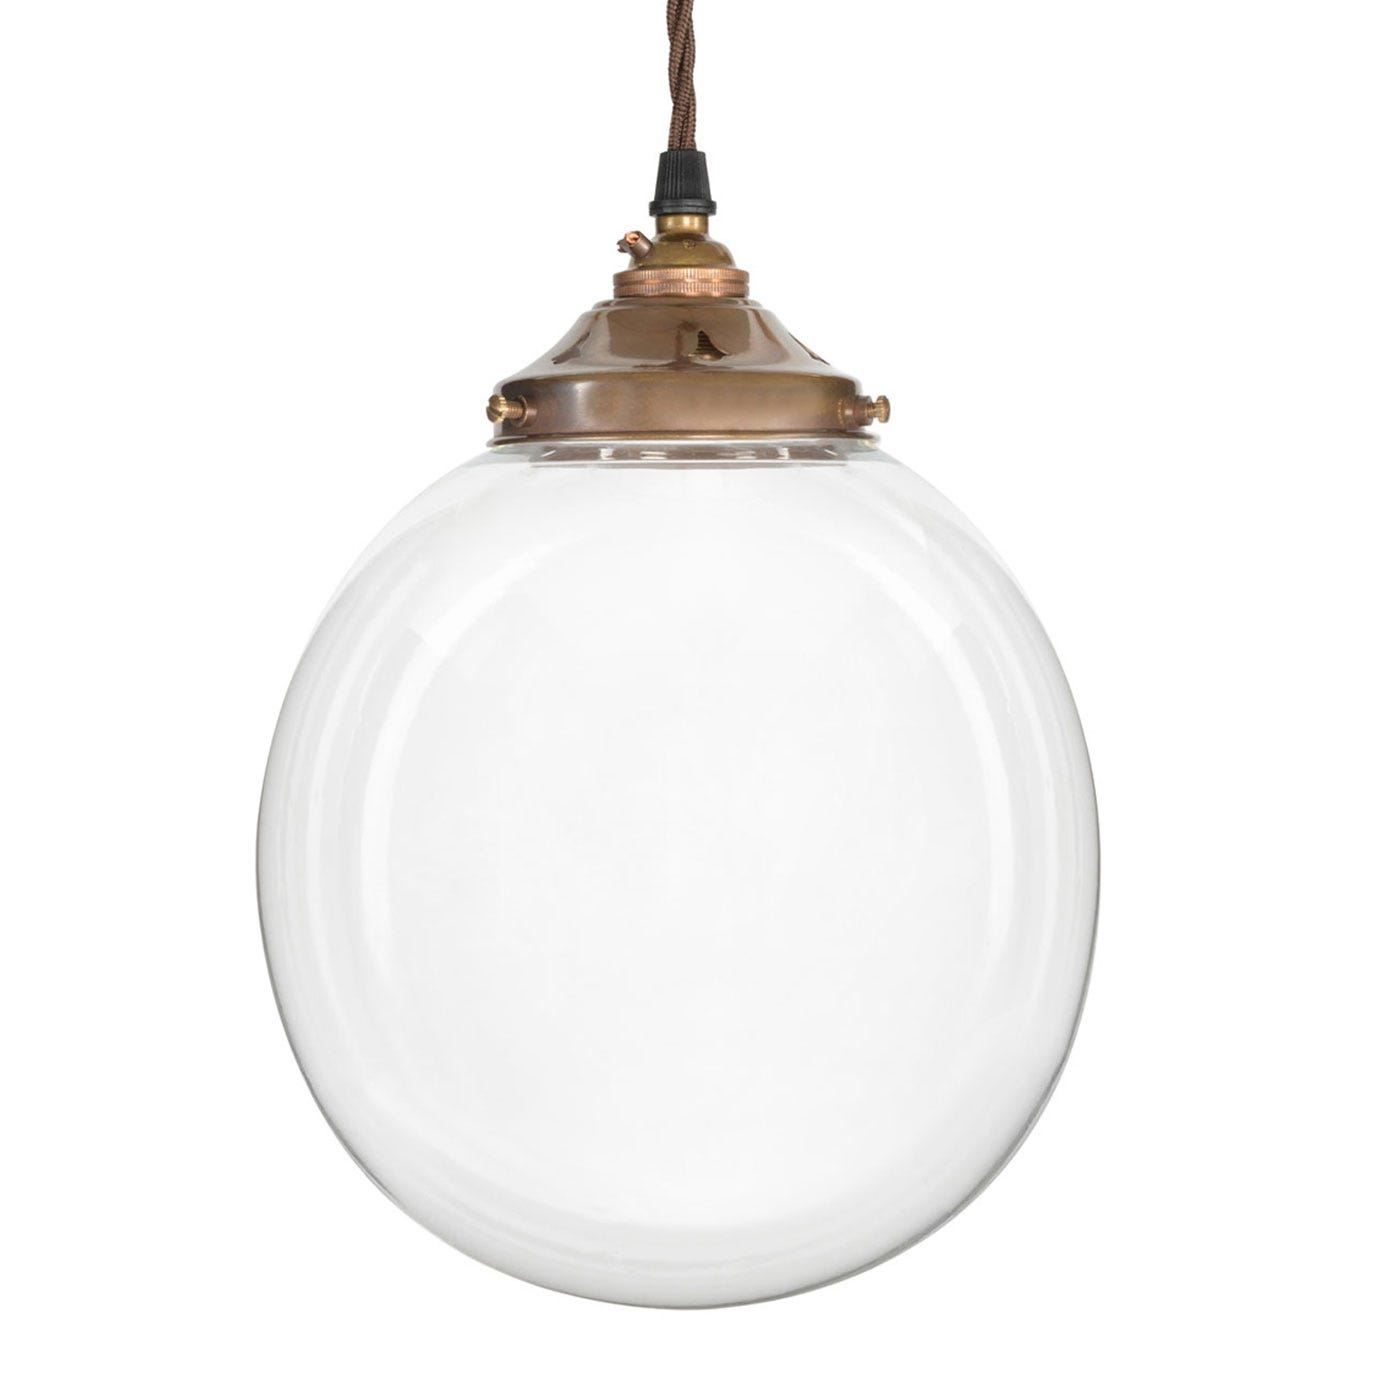 Old School Electric Glass Globe Pendant Light Antique ...